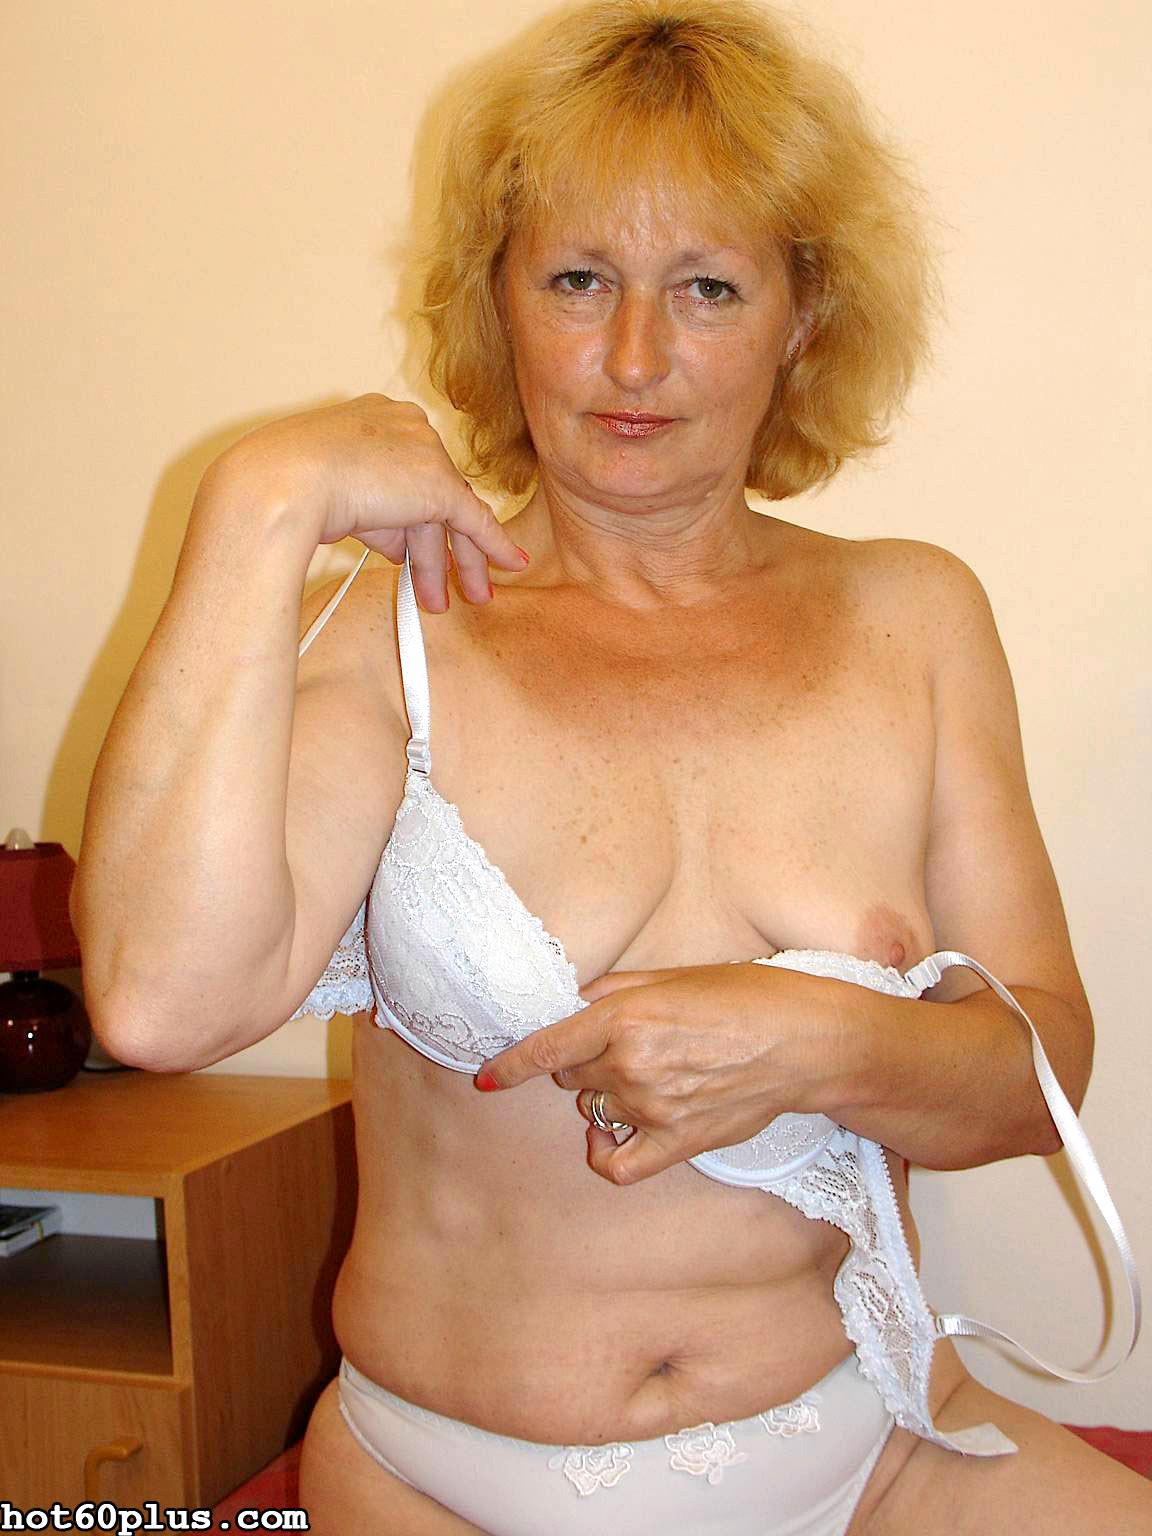 60 plus hot granny by troc 4